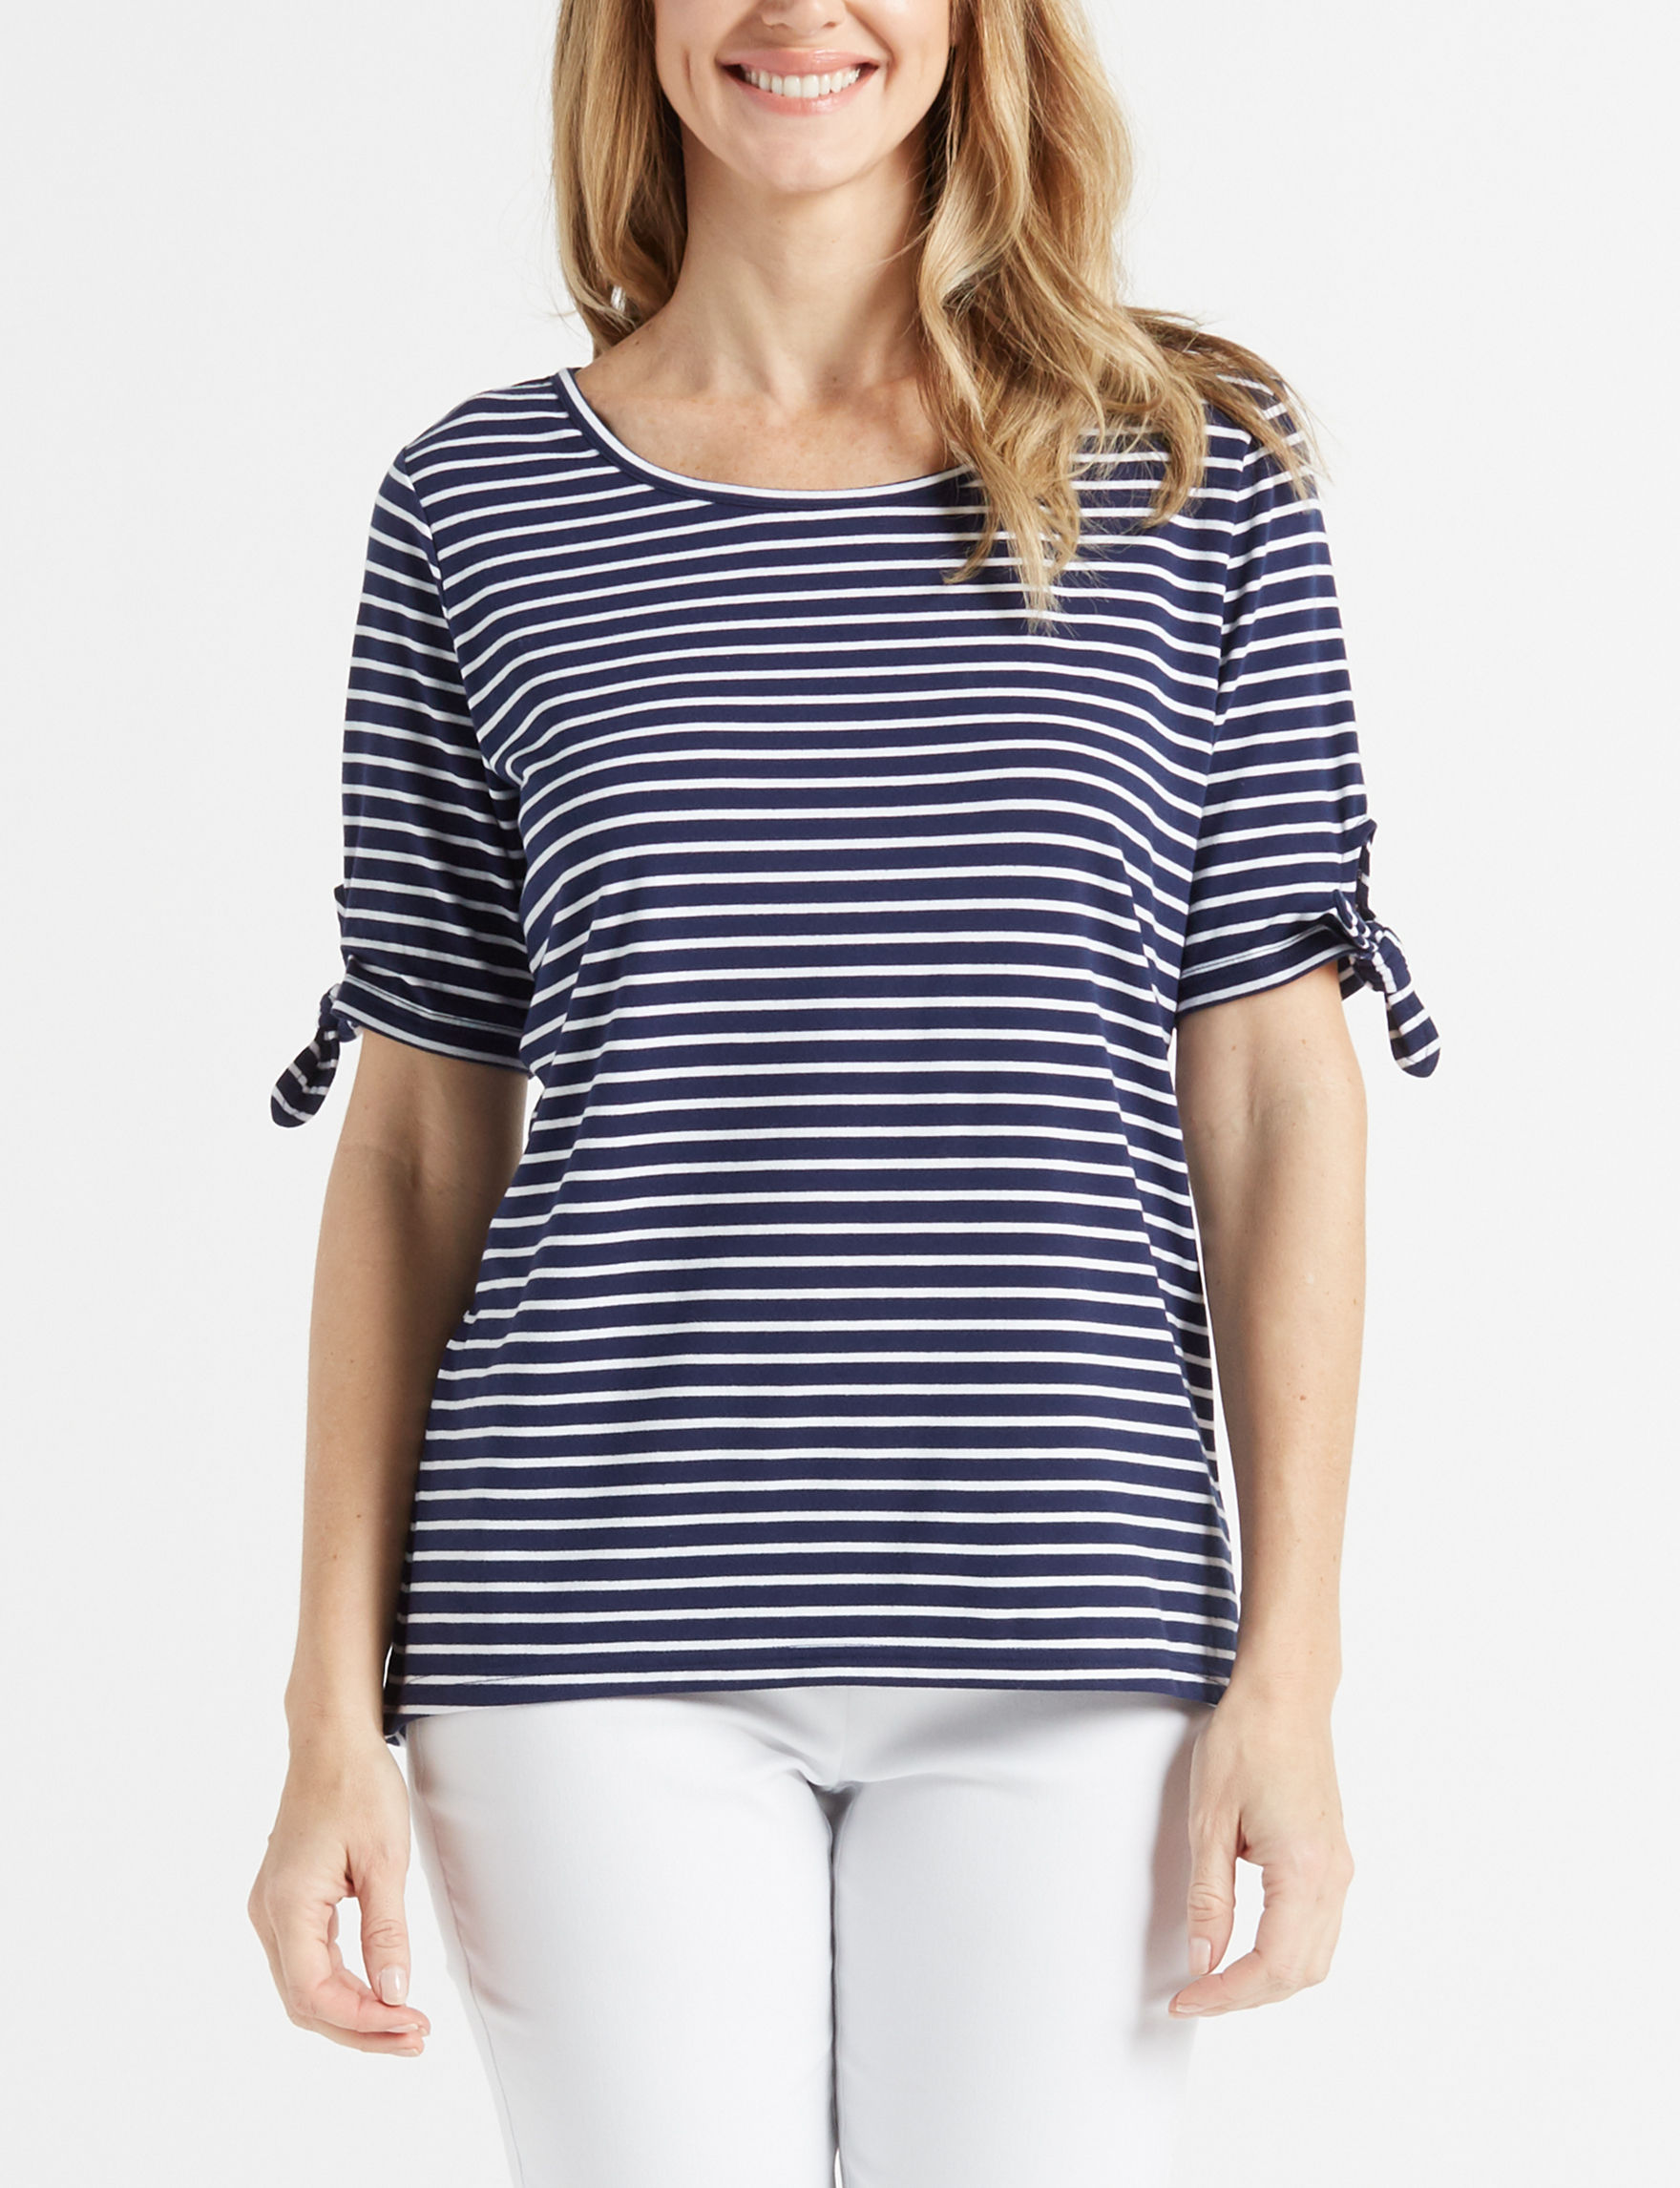 Onyx Blue / White Shirts & Blouses